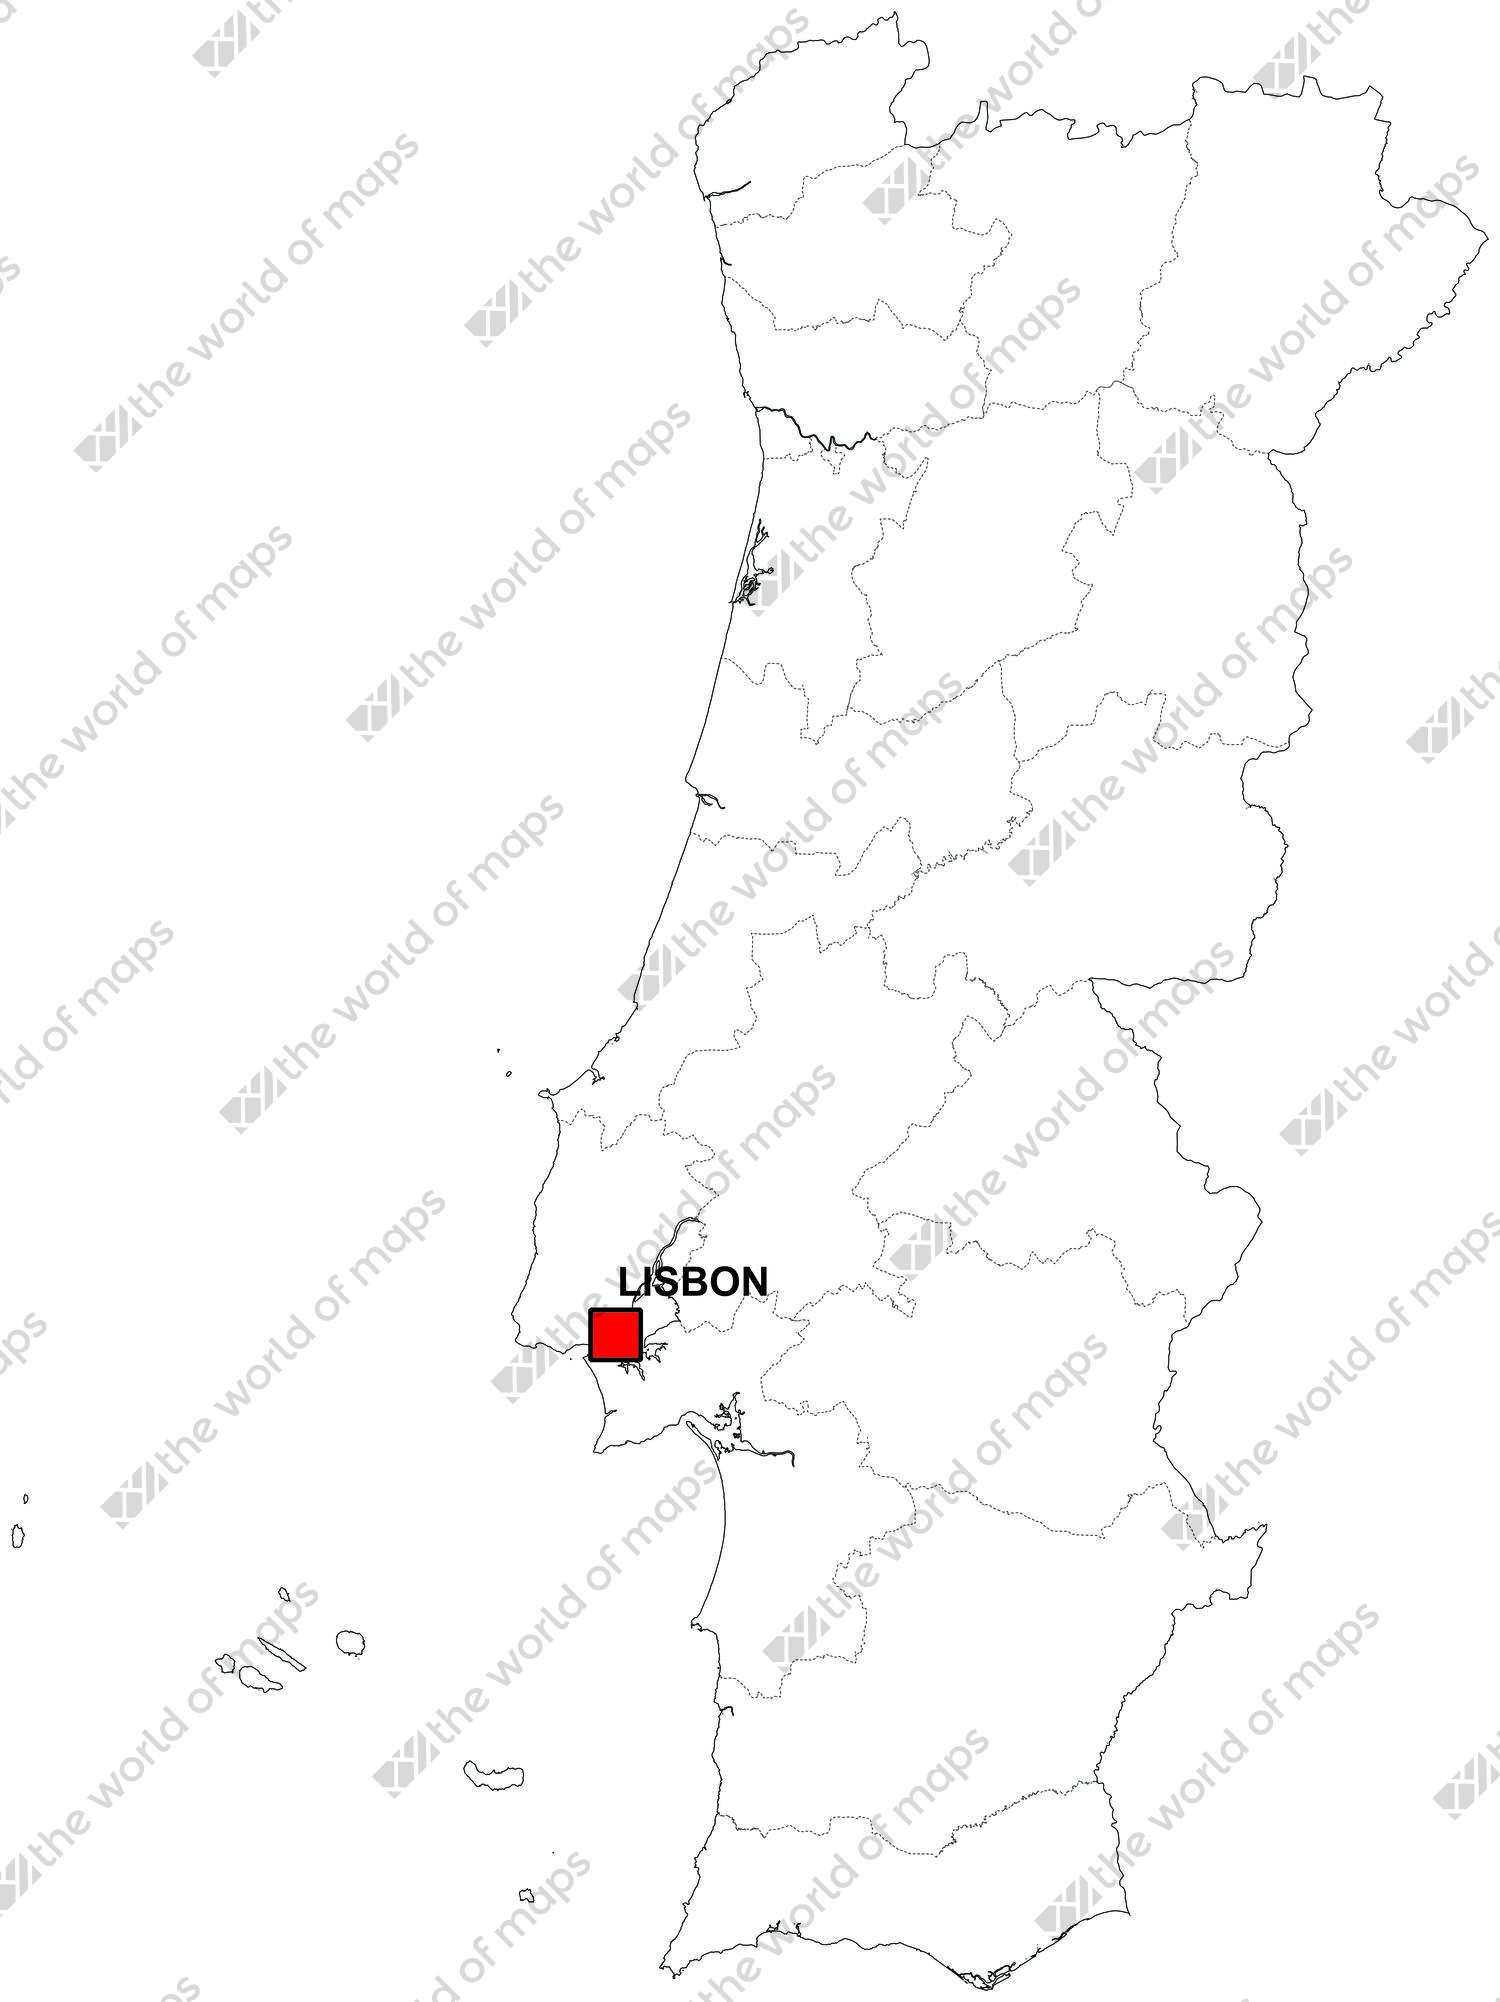 Digital map of Portugal (free)